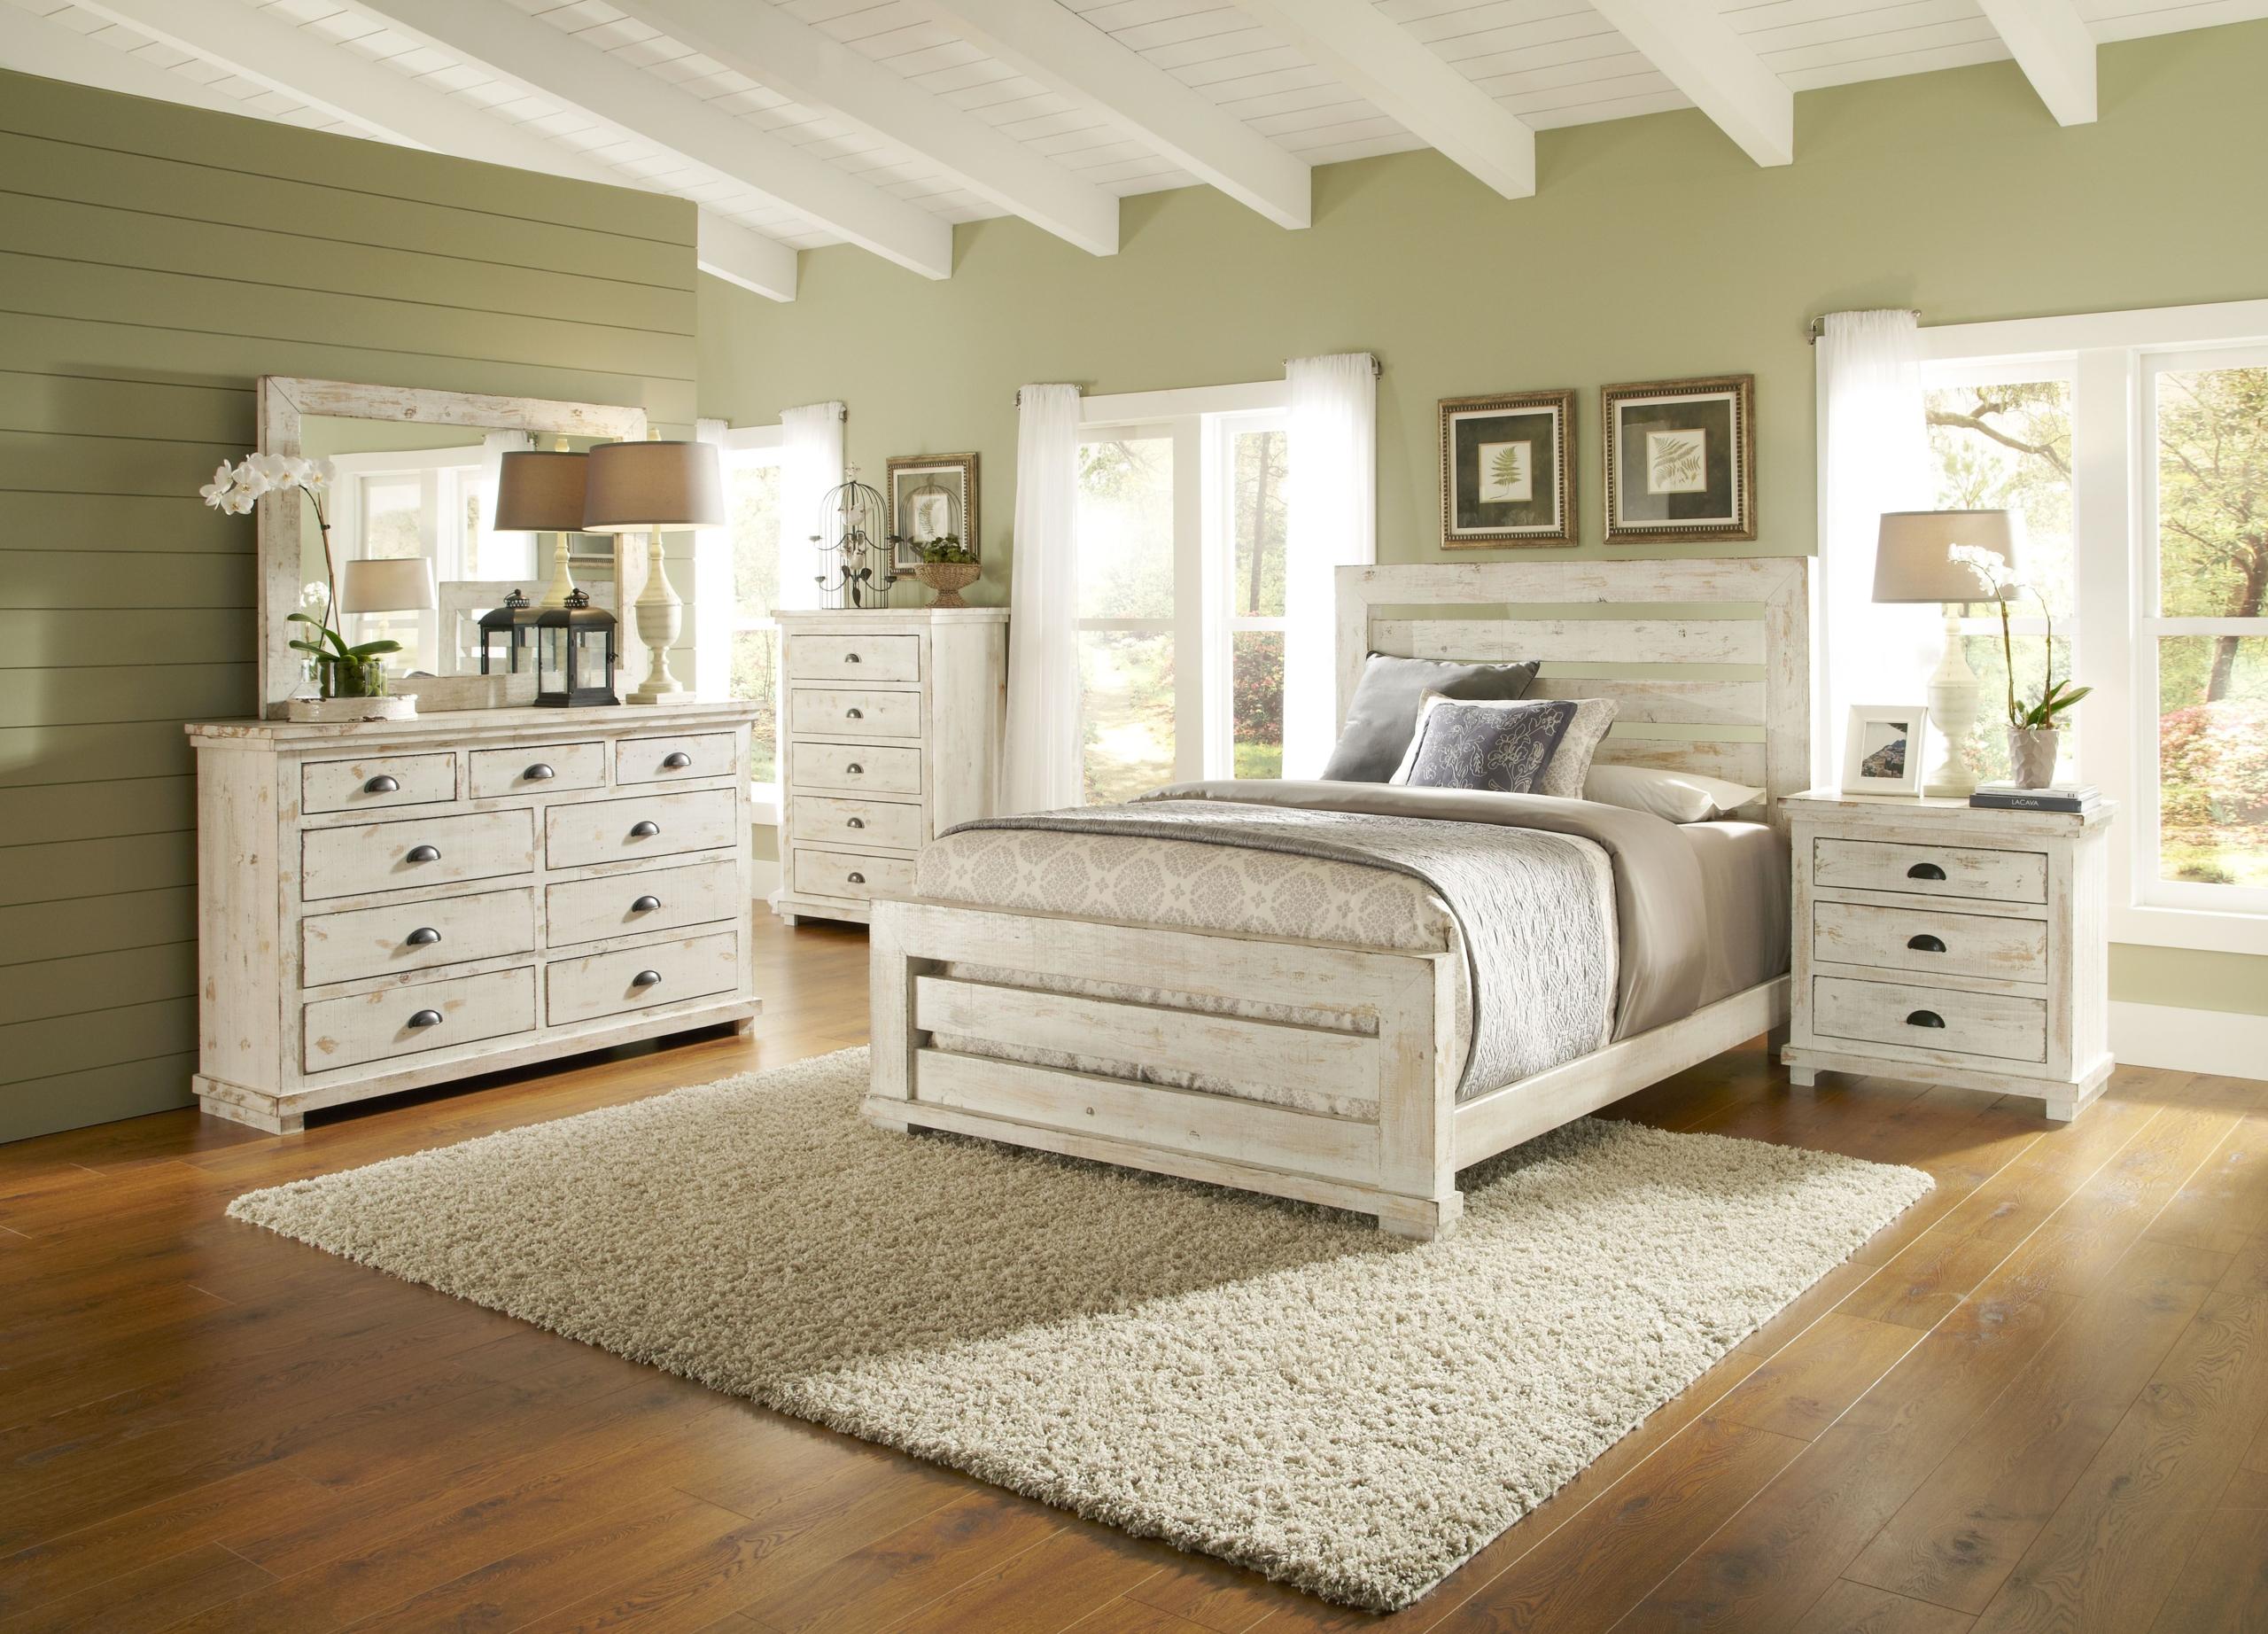 Luxury White Bedroom Sets Plans Free